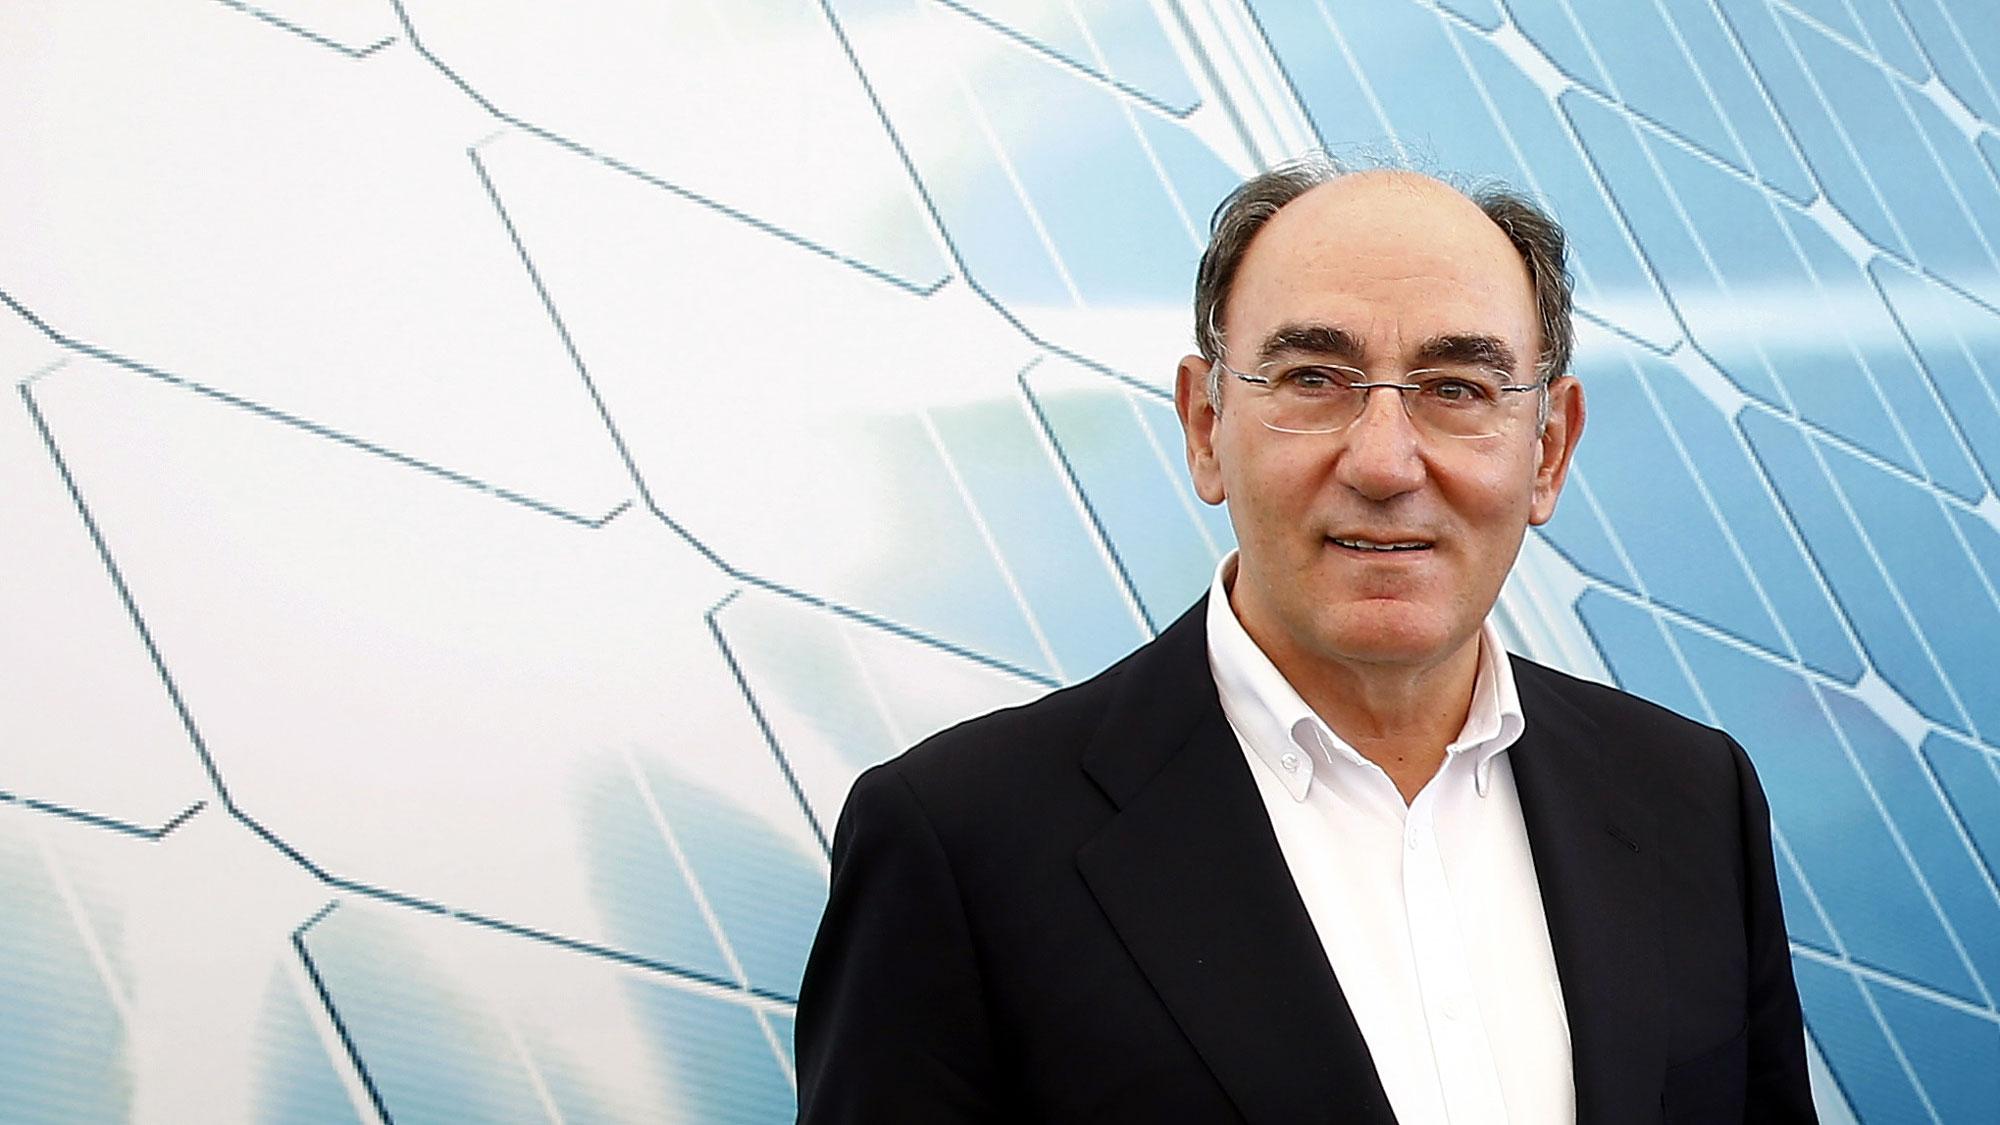 Iberdrola-and-Fertiberia-to-Produce-Green-Hydrogen-for-Industrial-Use-in-Europe---Ignacio-Galan,-CEO-of-Iberdrola